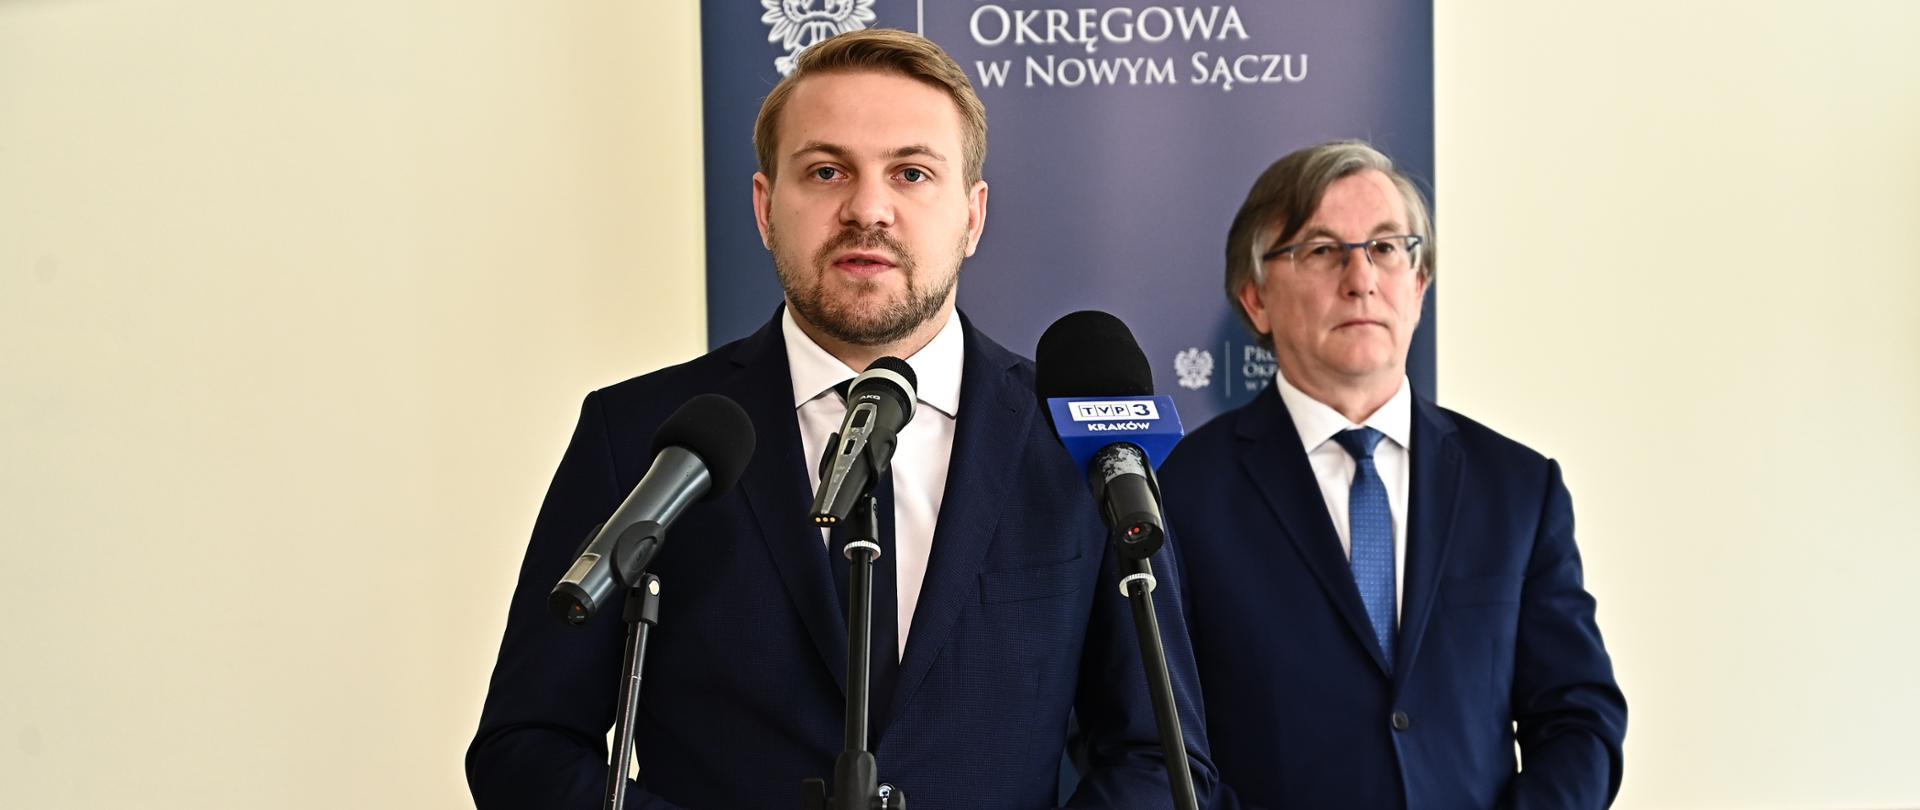 wiceminister klimatu Jacek Ozdoba